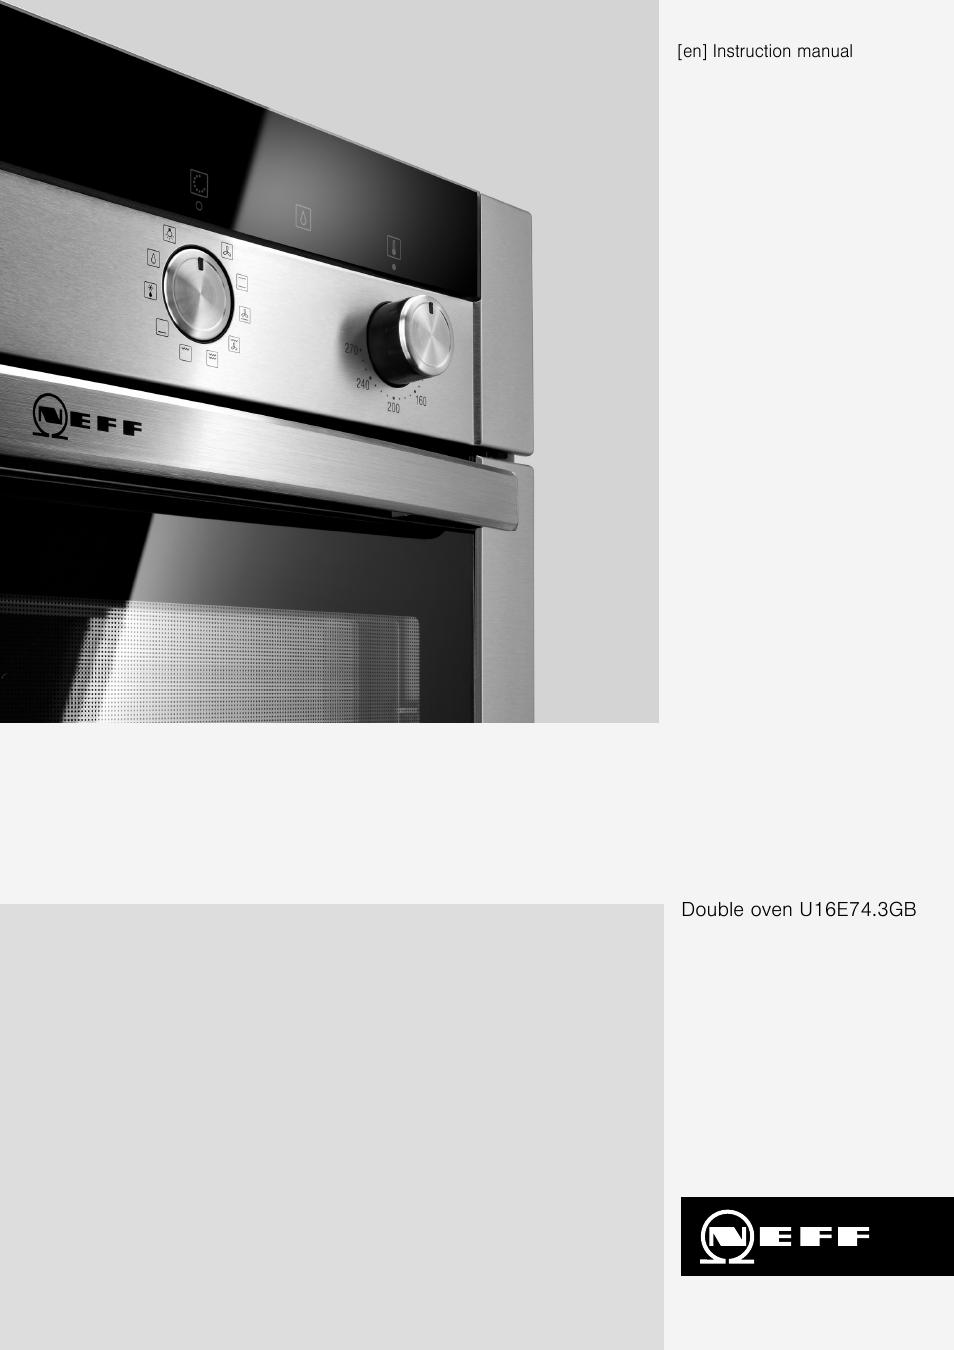 neff u16e74n3gb user manual 36 pages rh manualsdir com neff instruction manual fridge freezer neff instruction manual for dishwasher